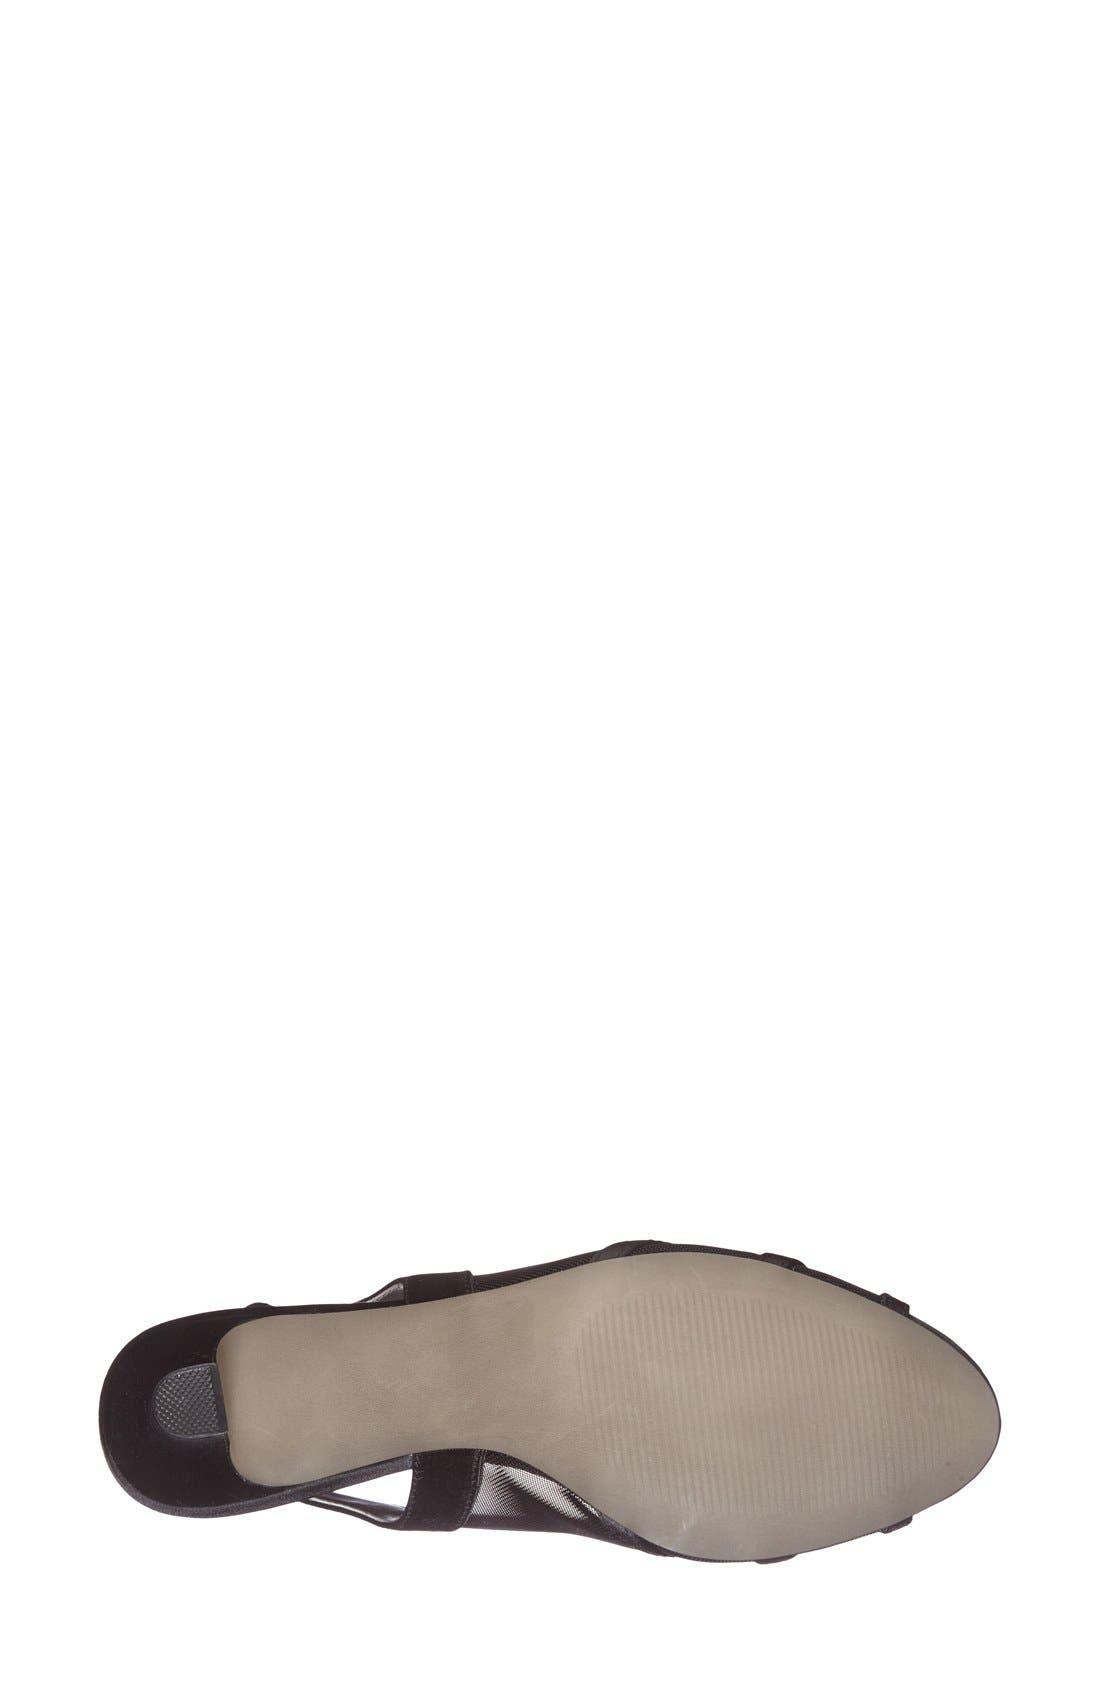 'Petal' Open Toe Slingback Pump,                             Alternate thumbnail 3, color,                             001